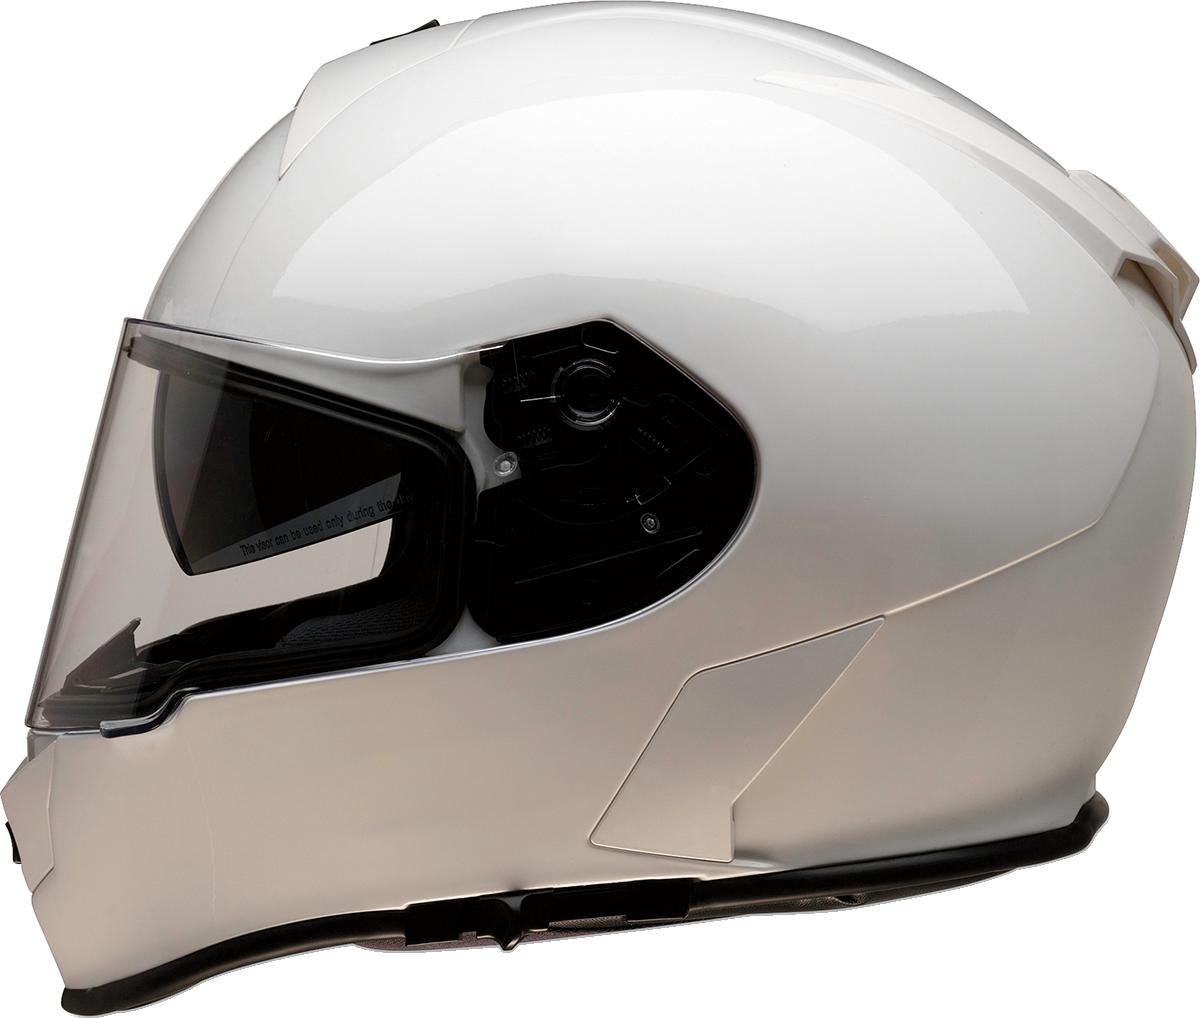 Z1R Warrant Unisex White Full Face Motorcycle Riding Street Racing Helmet